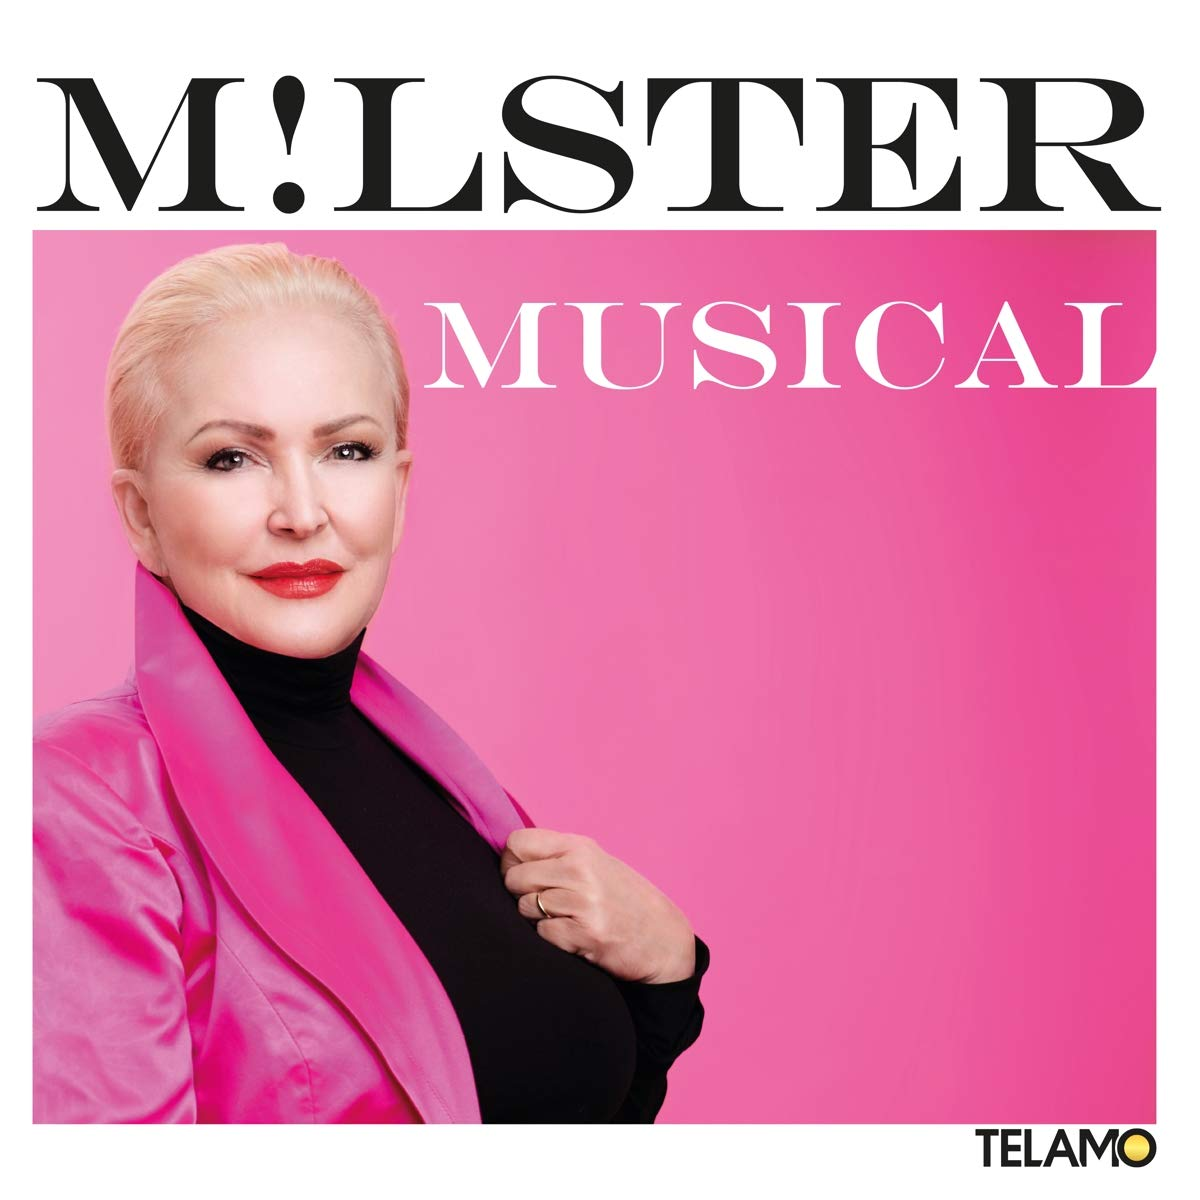 ANGELIKA MILSTER * M!lster singt Musical (CD)